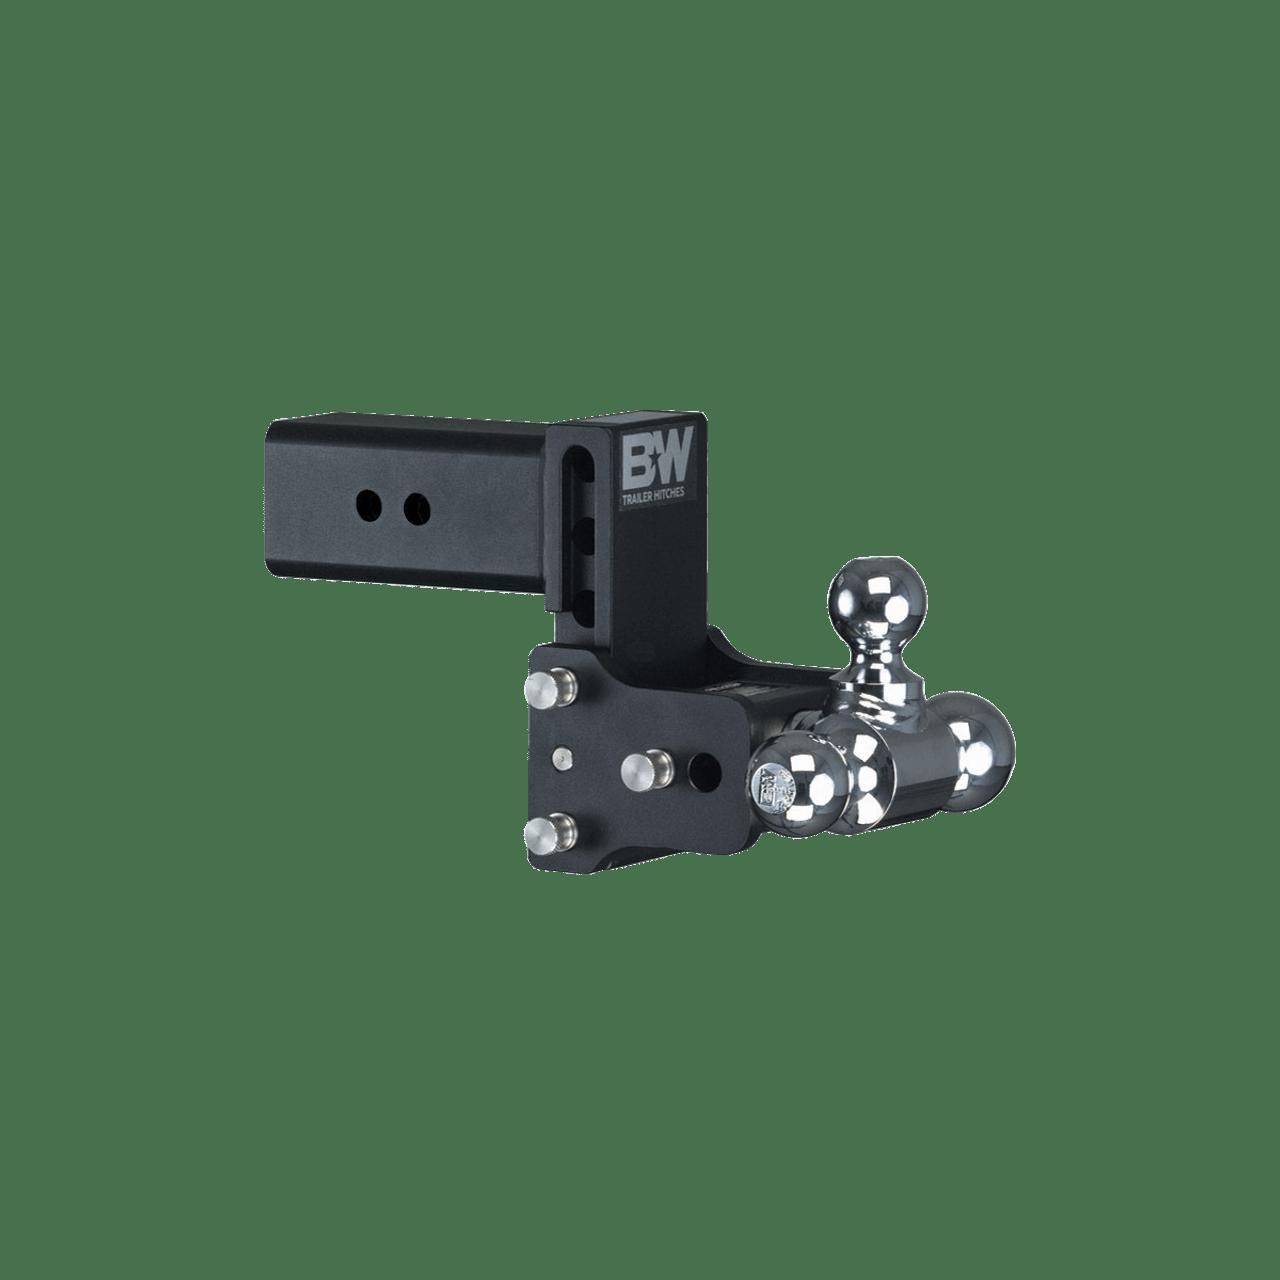 "BW30048B --- B&W 3"" Shank Tow and Stow Adjustable Tri-Ball Mount, 4.5"" Maximum Drop"